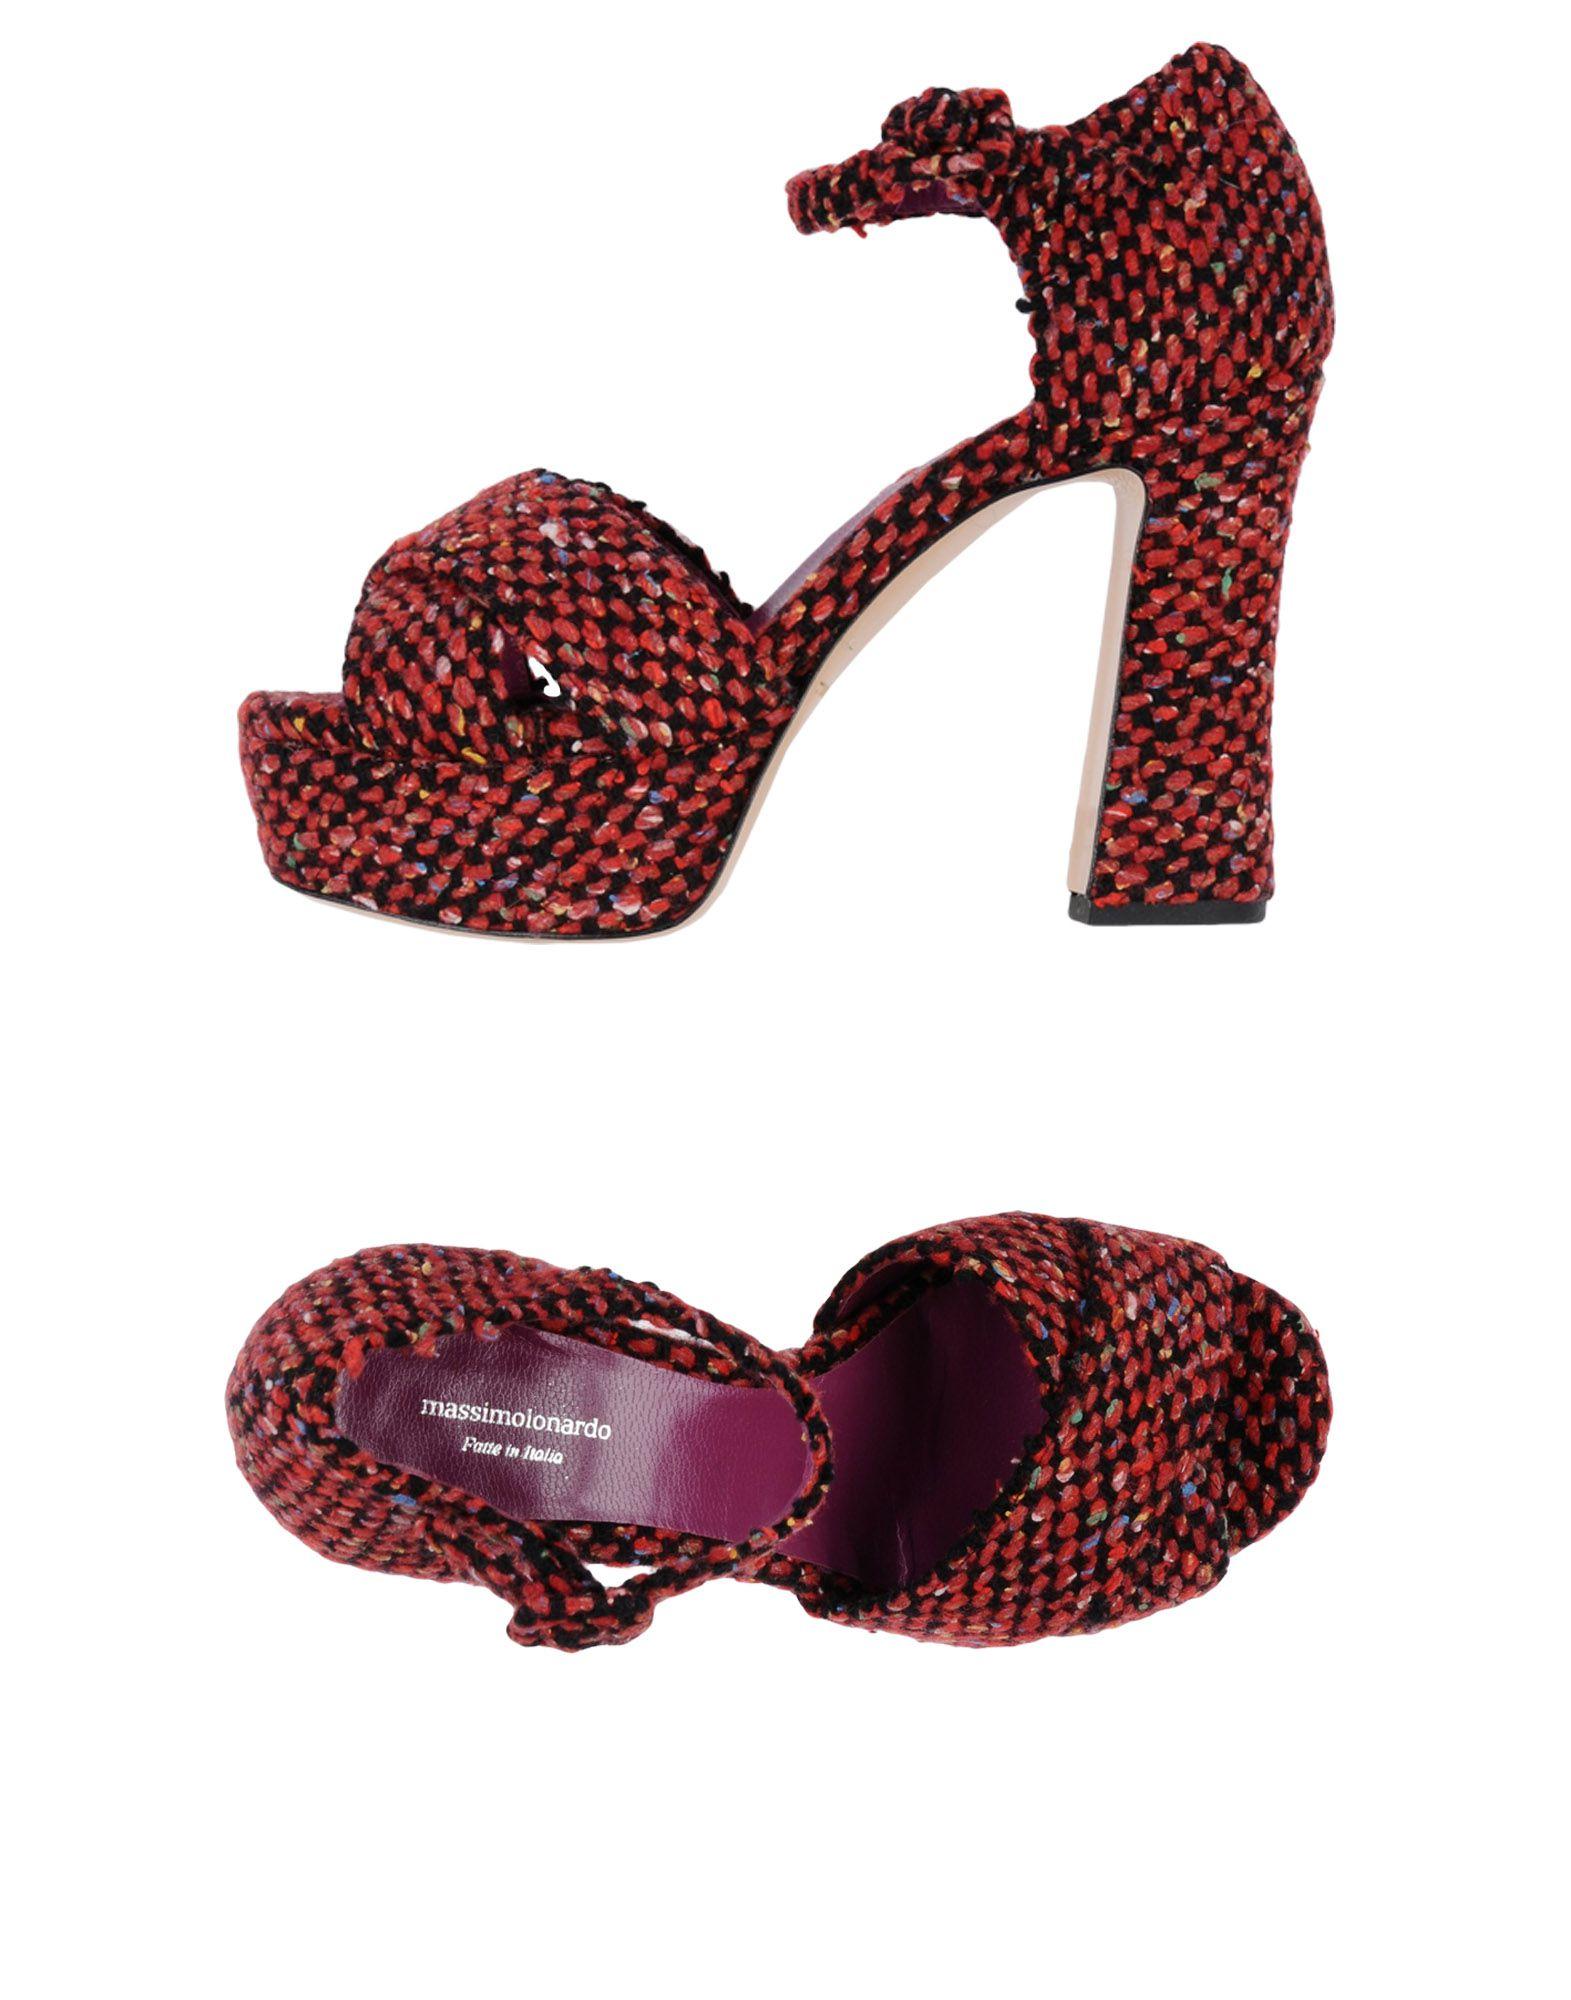 MASSIMO LONARDO Sandals in Garnet